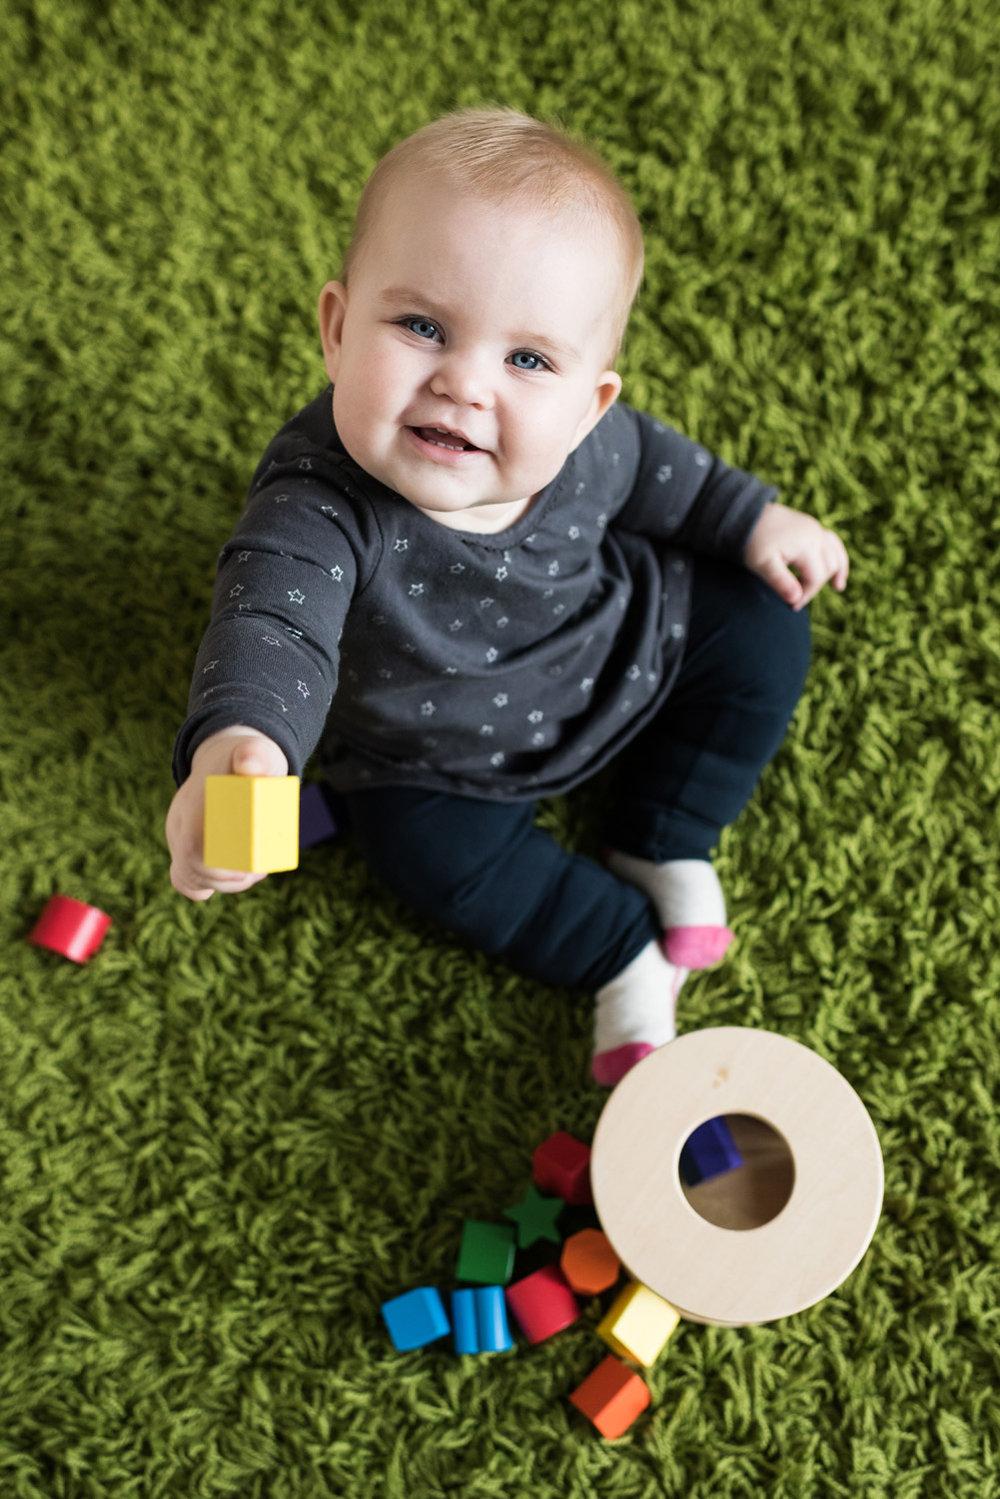 nyc family photographer-11112017_25.jpg